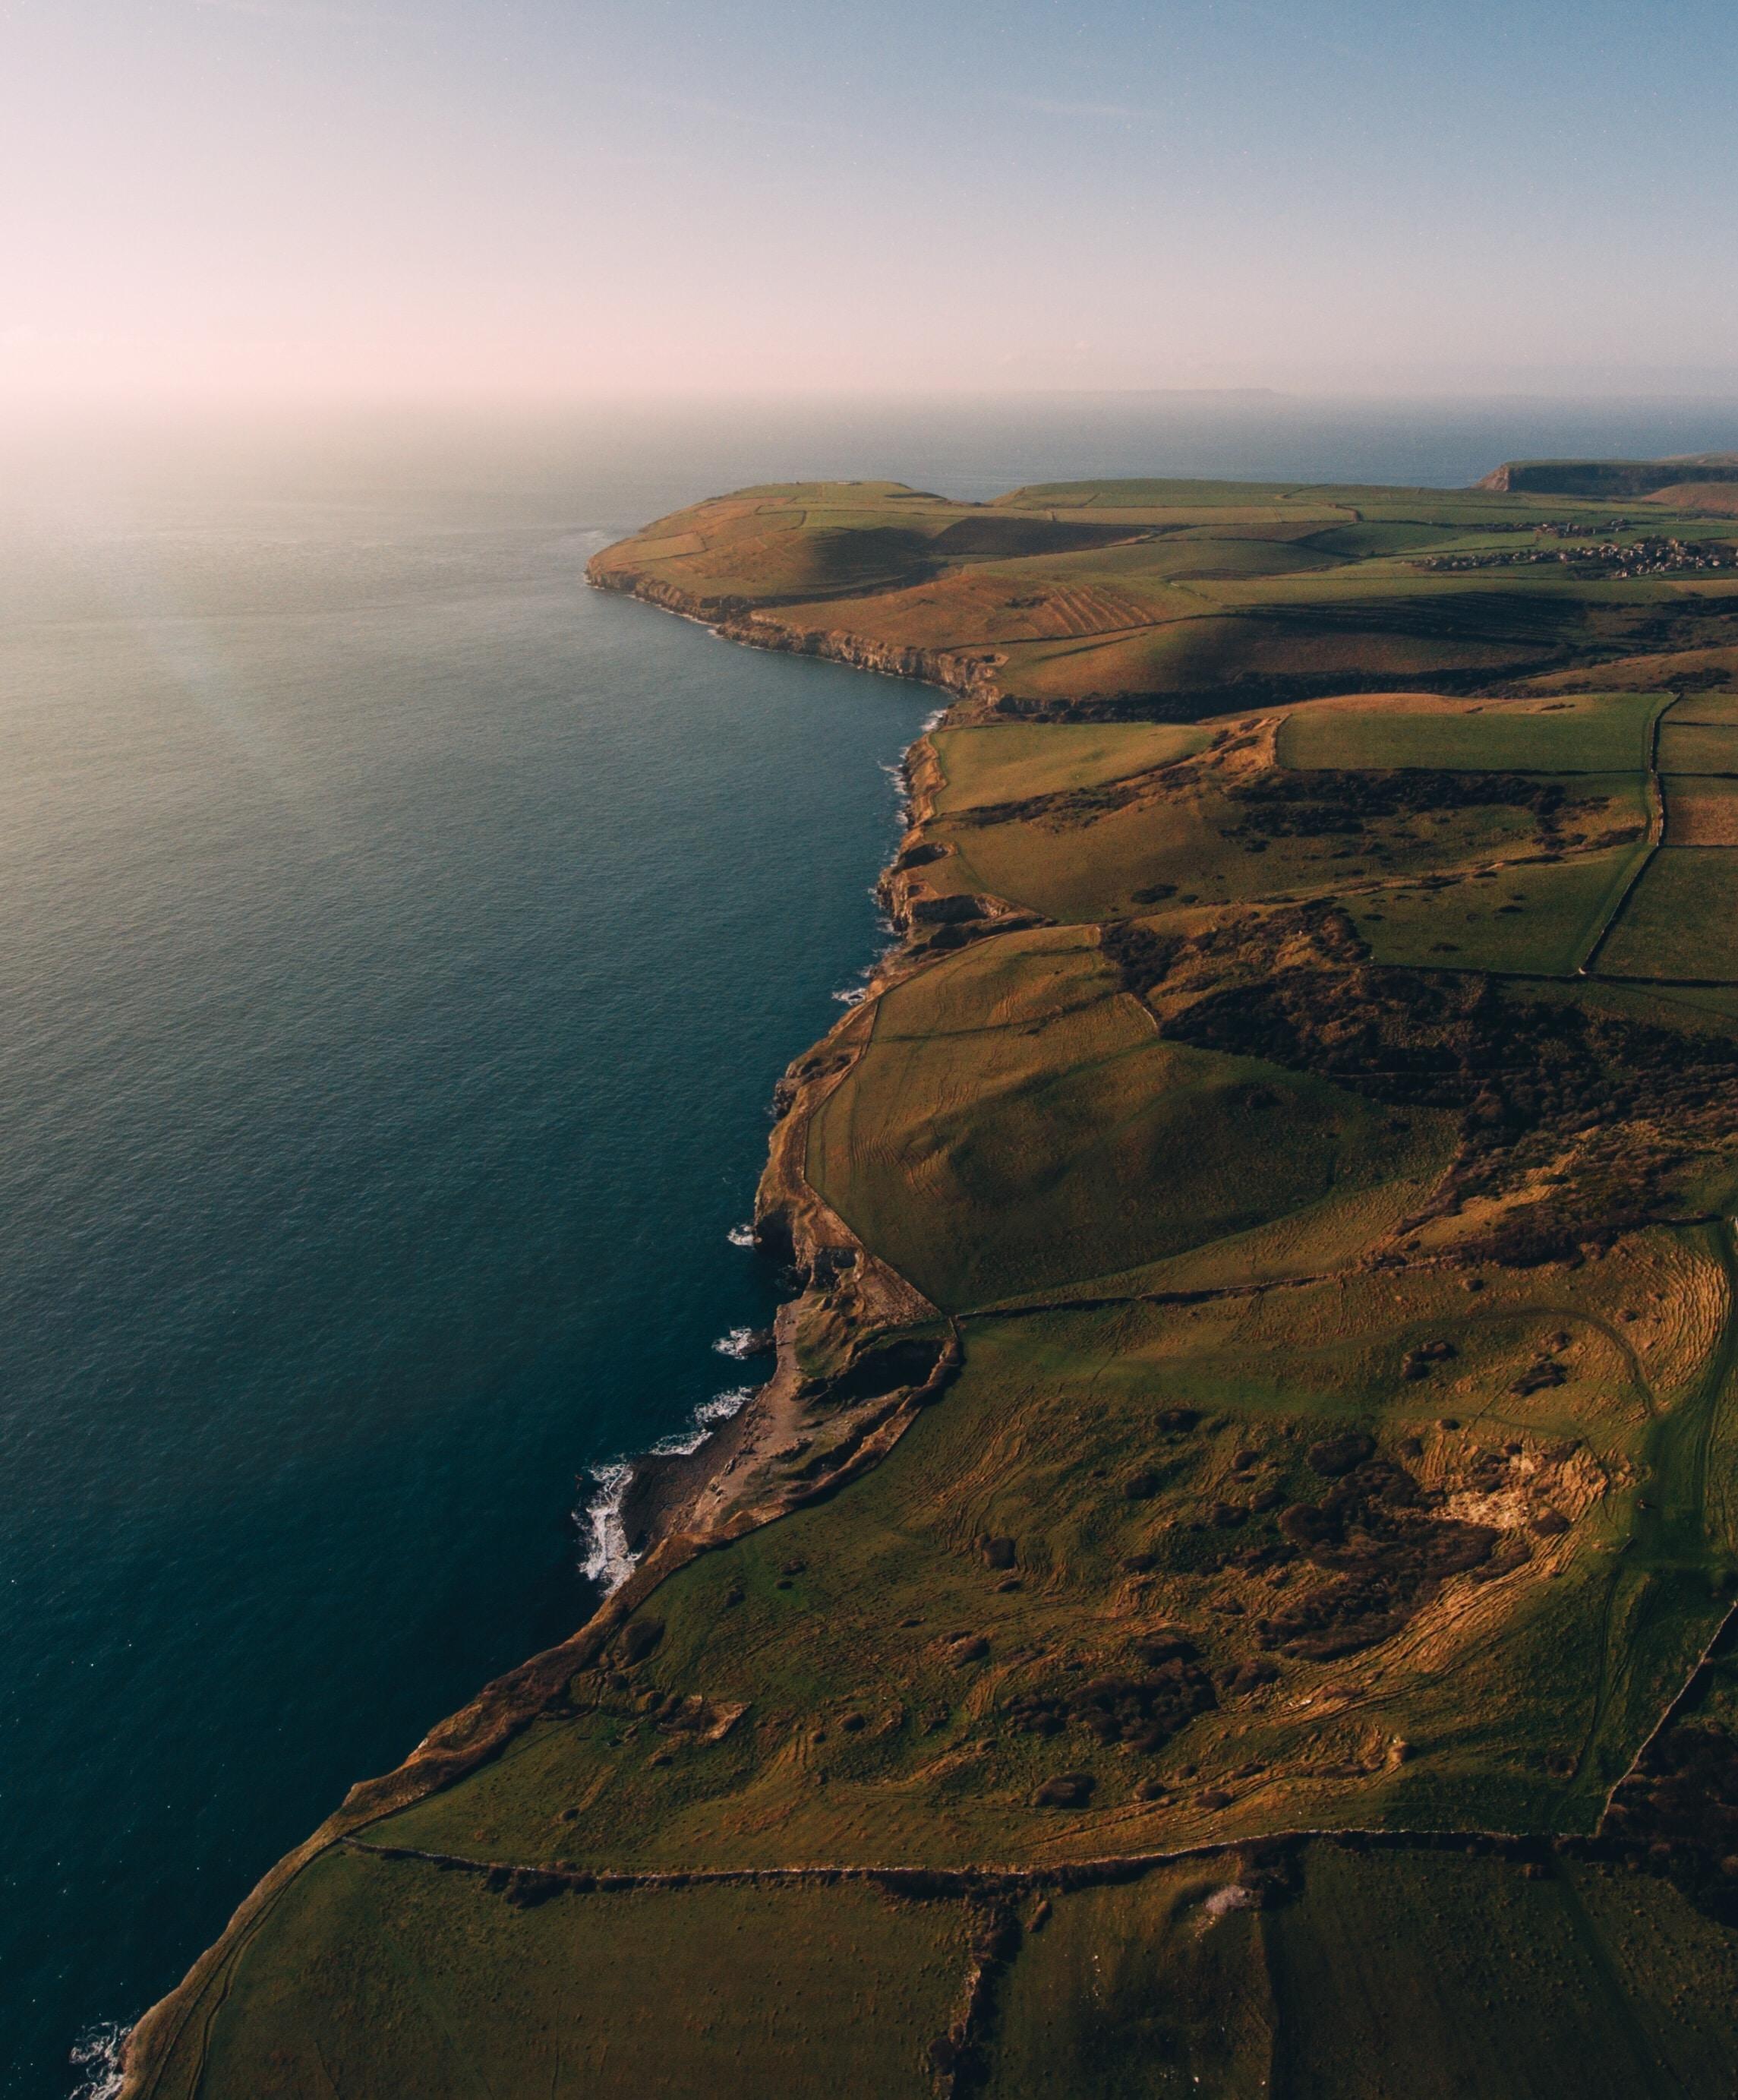 Drone shot of a coastline.